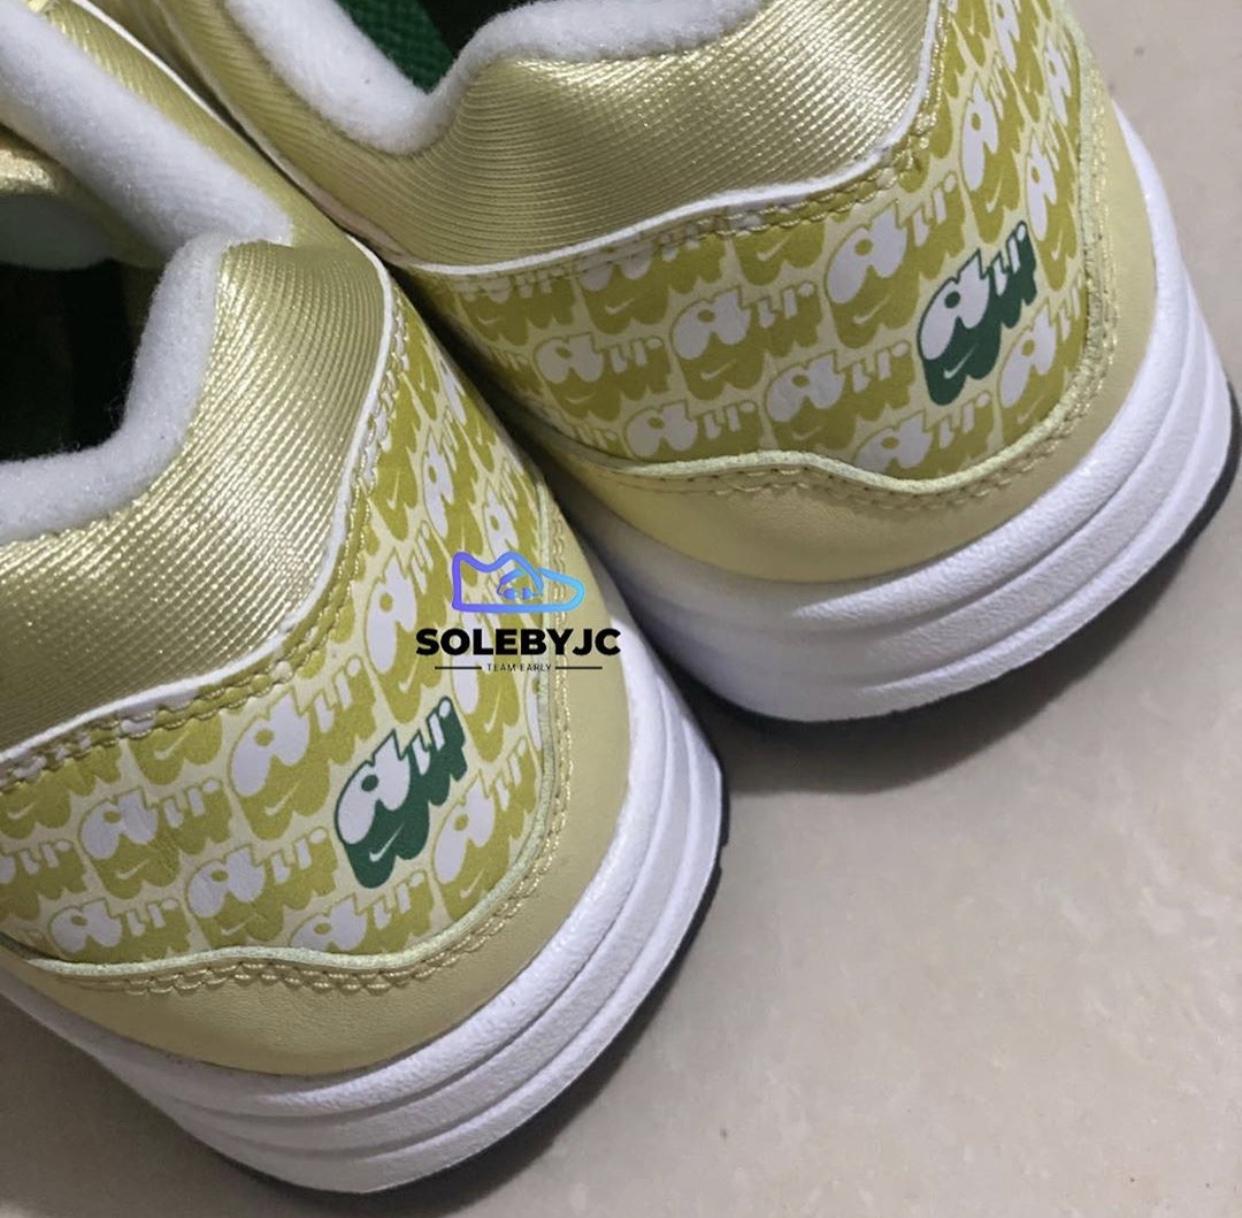 Nike Air Max, Nike Air, Lemonade, Air Max 1, Air Max